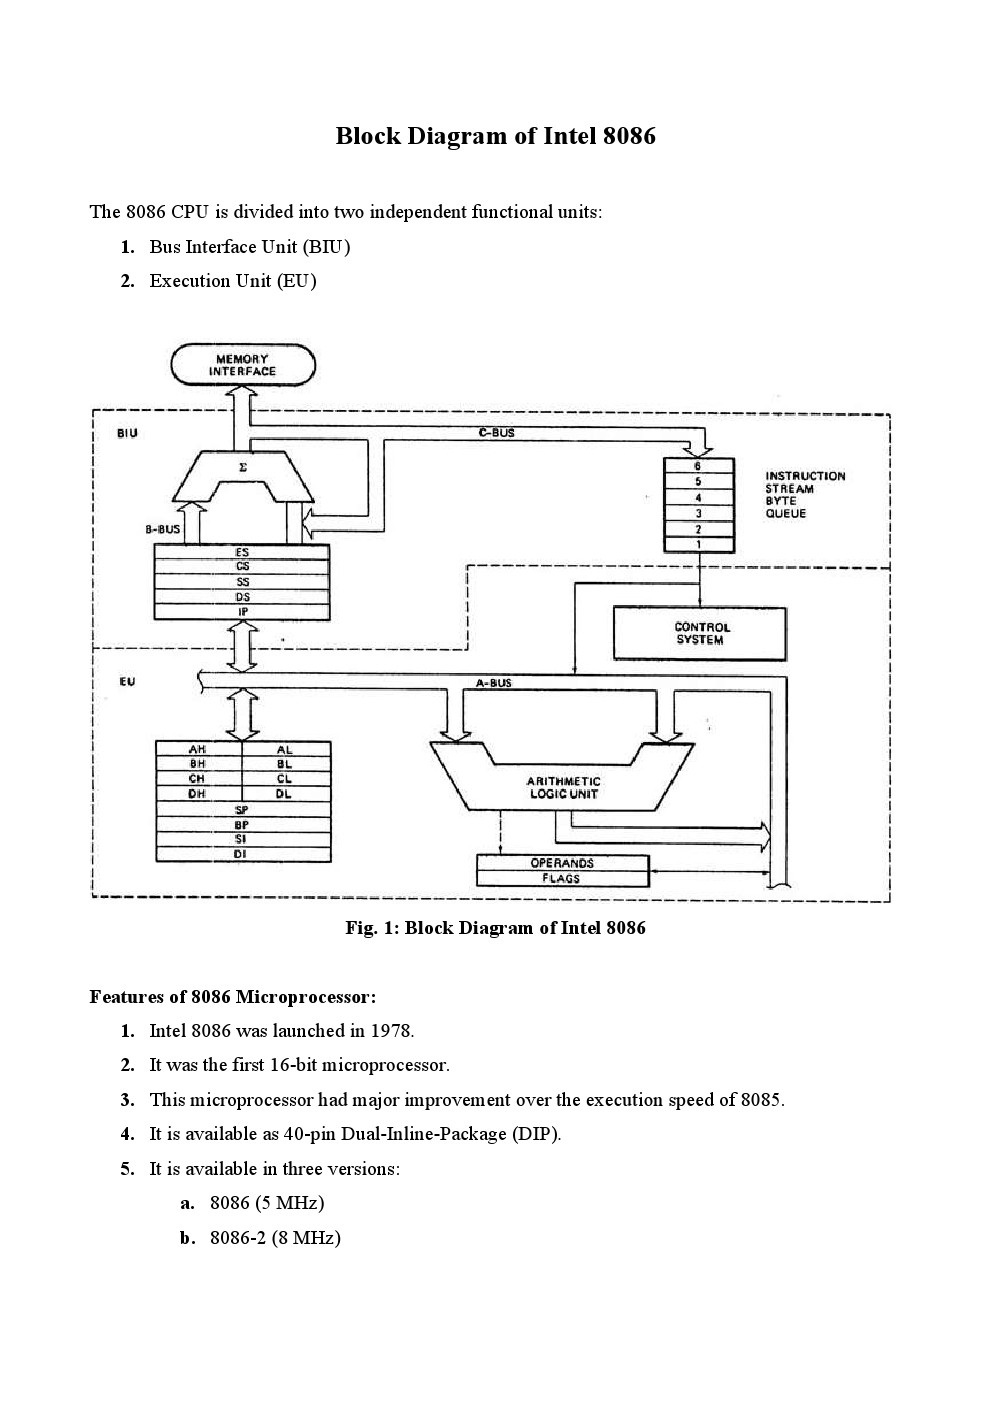 Block Diagram of 8086 Microprocessor | Study Materials